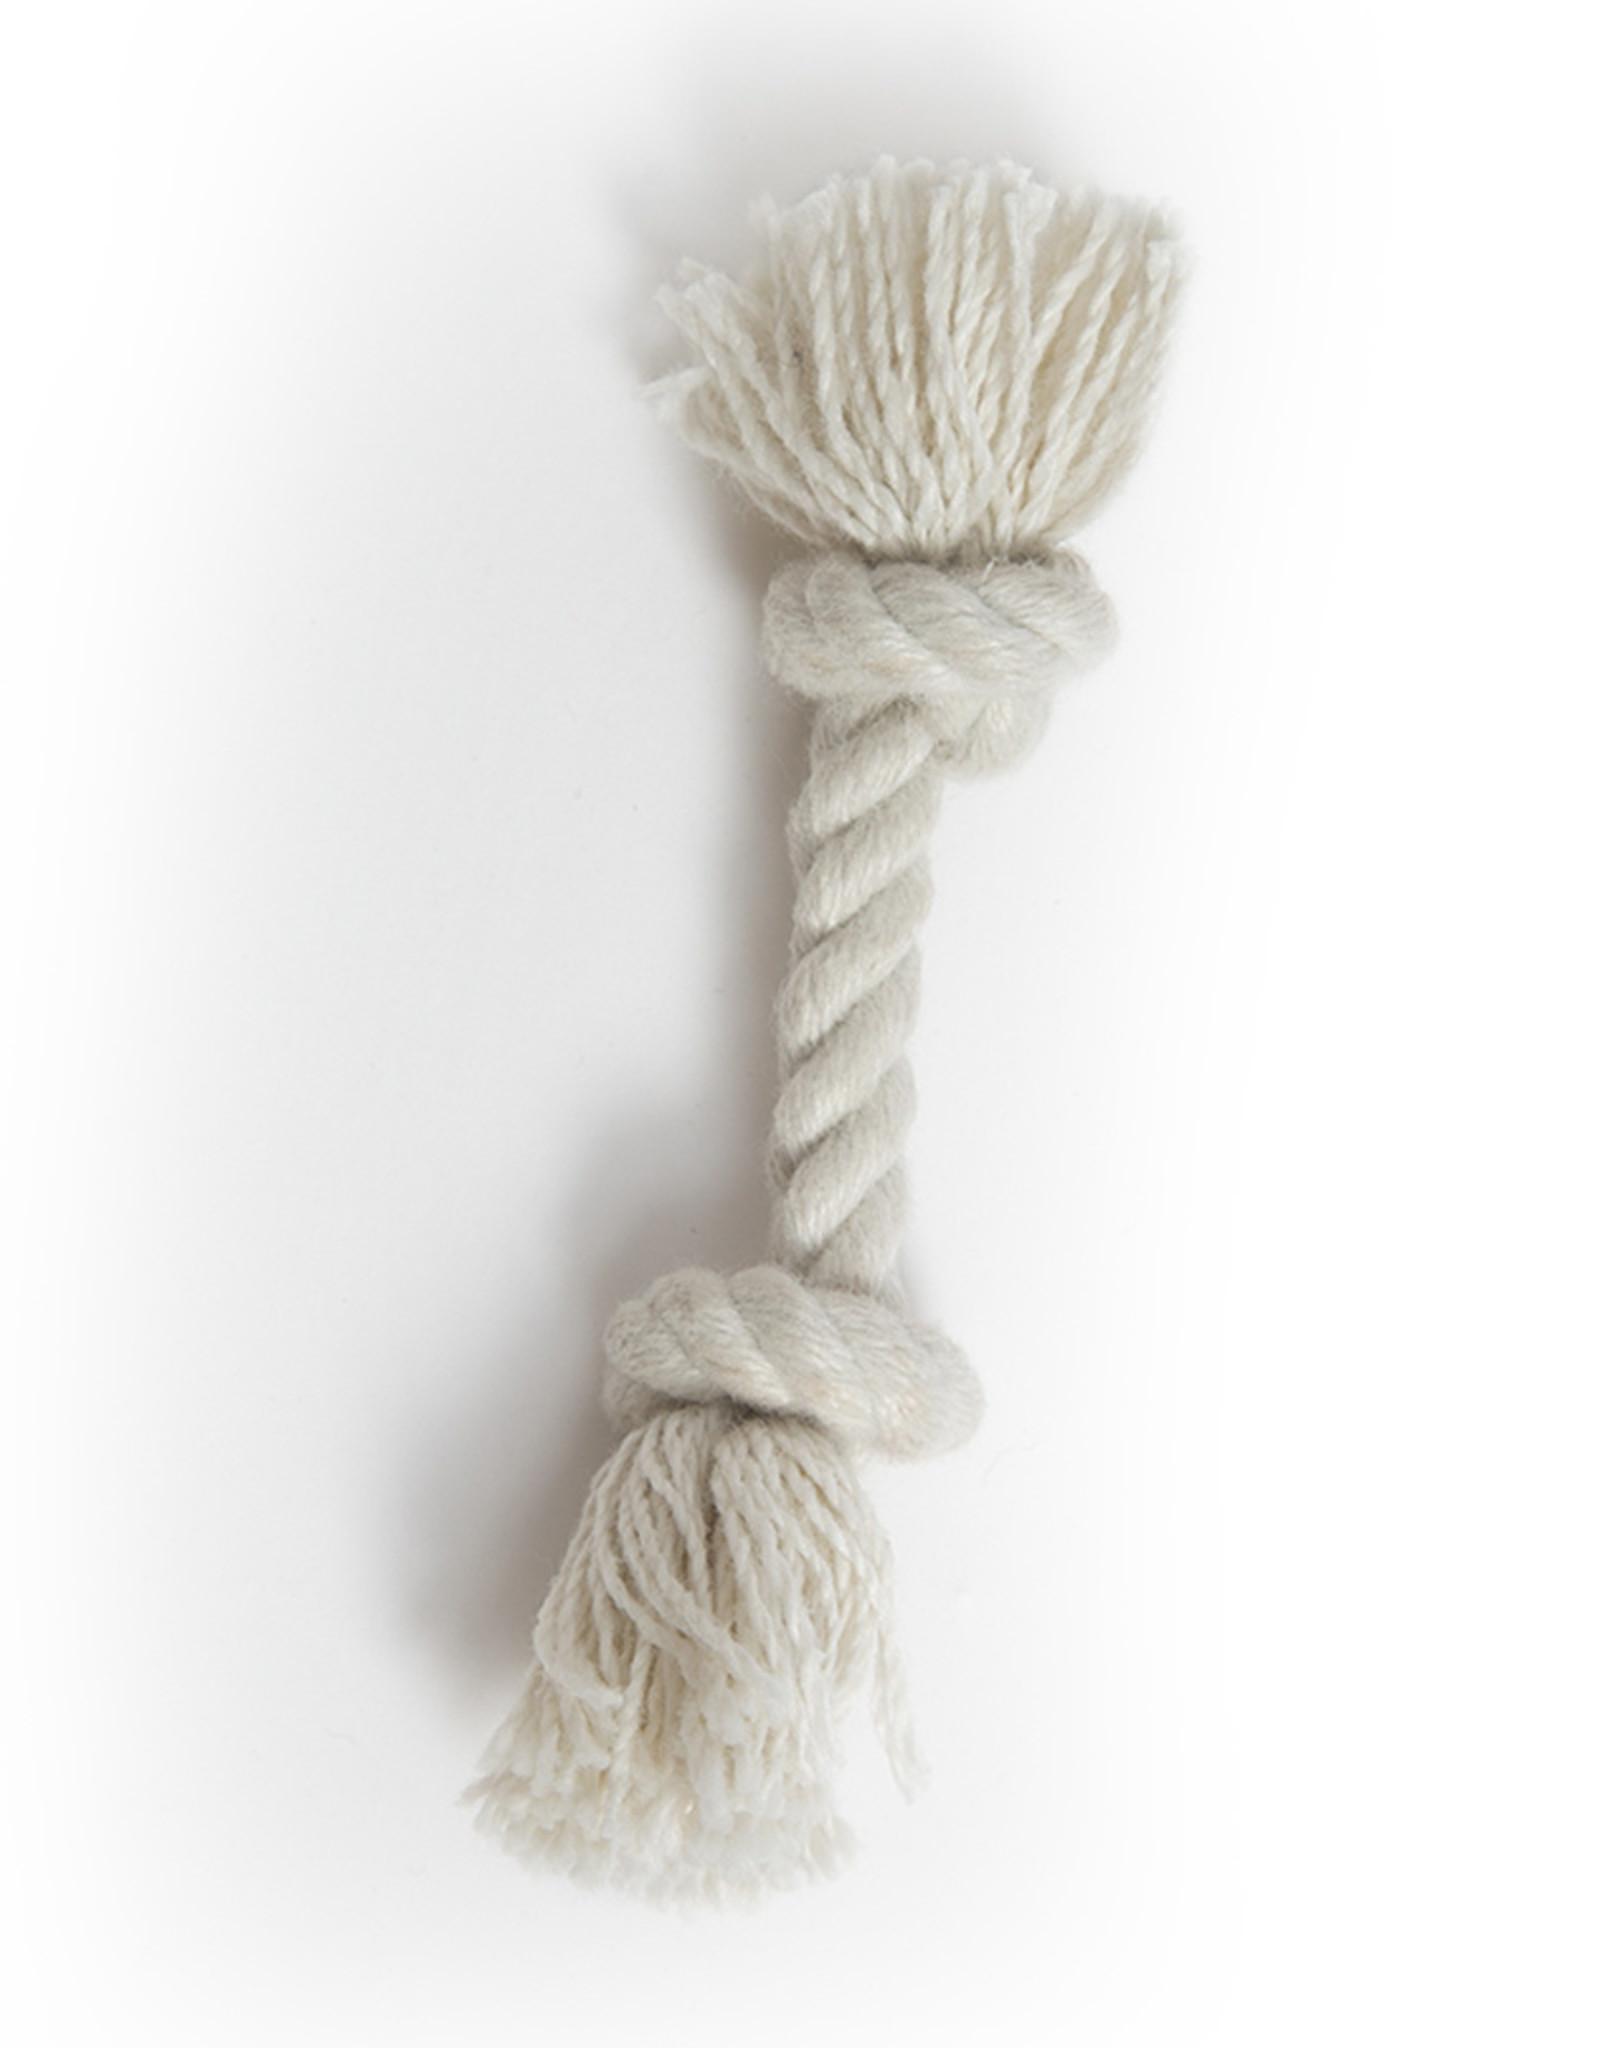 51 Degrees North Resploot rope 2 knots